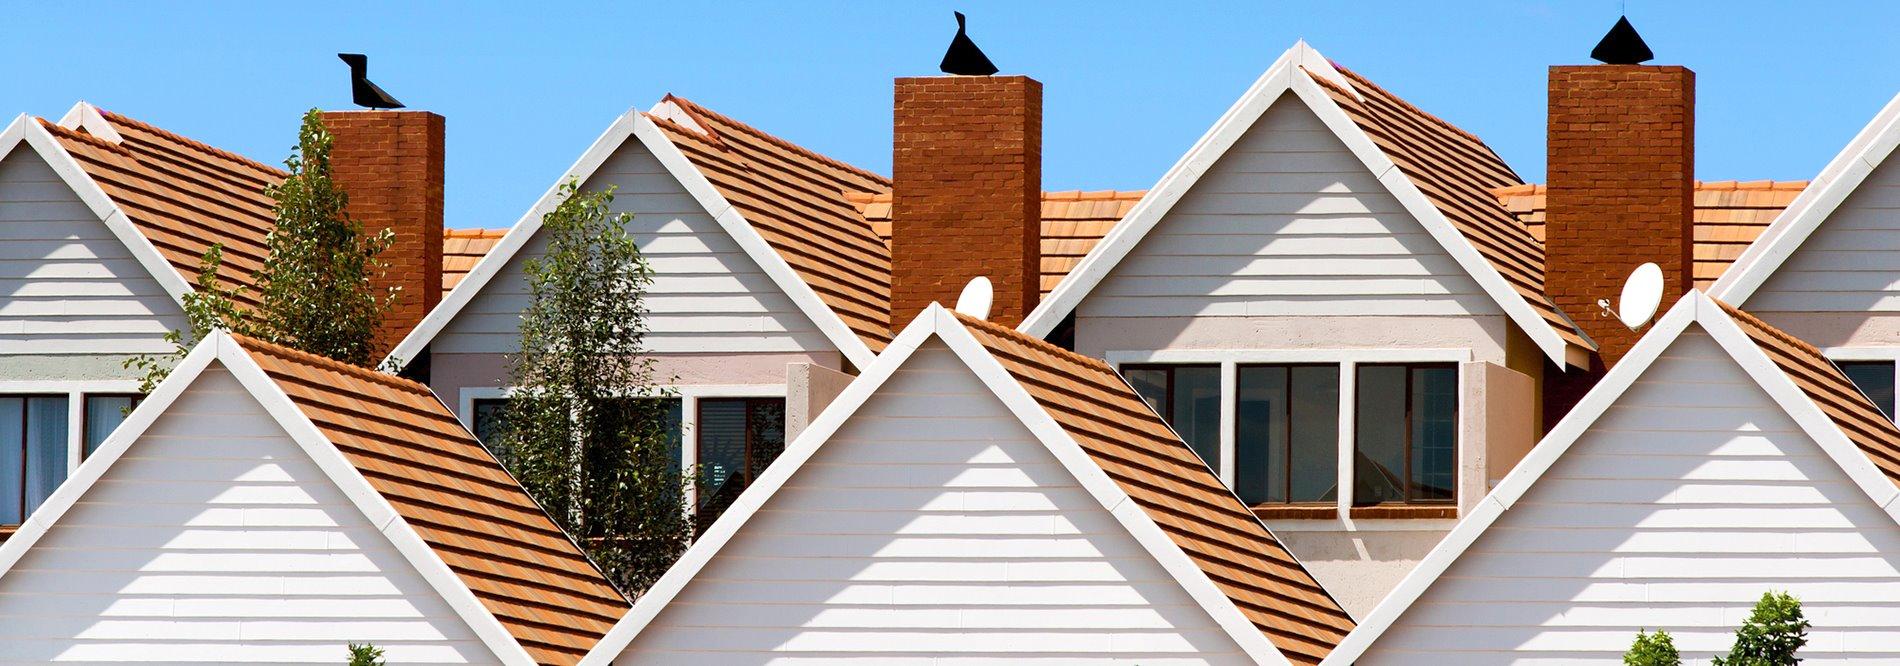 Residential property https://www.bellgully.com/expertise/residential-property